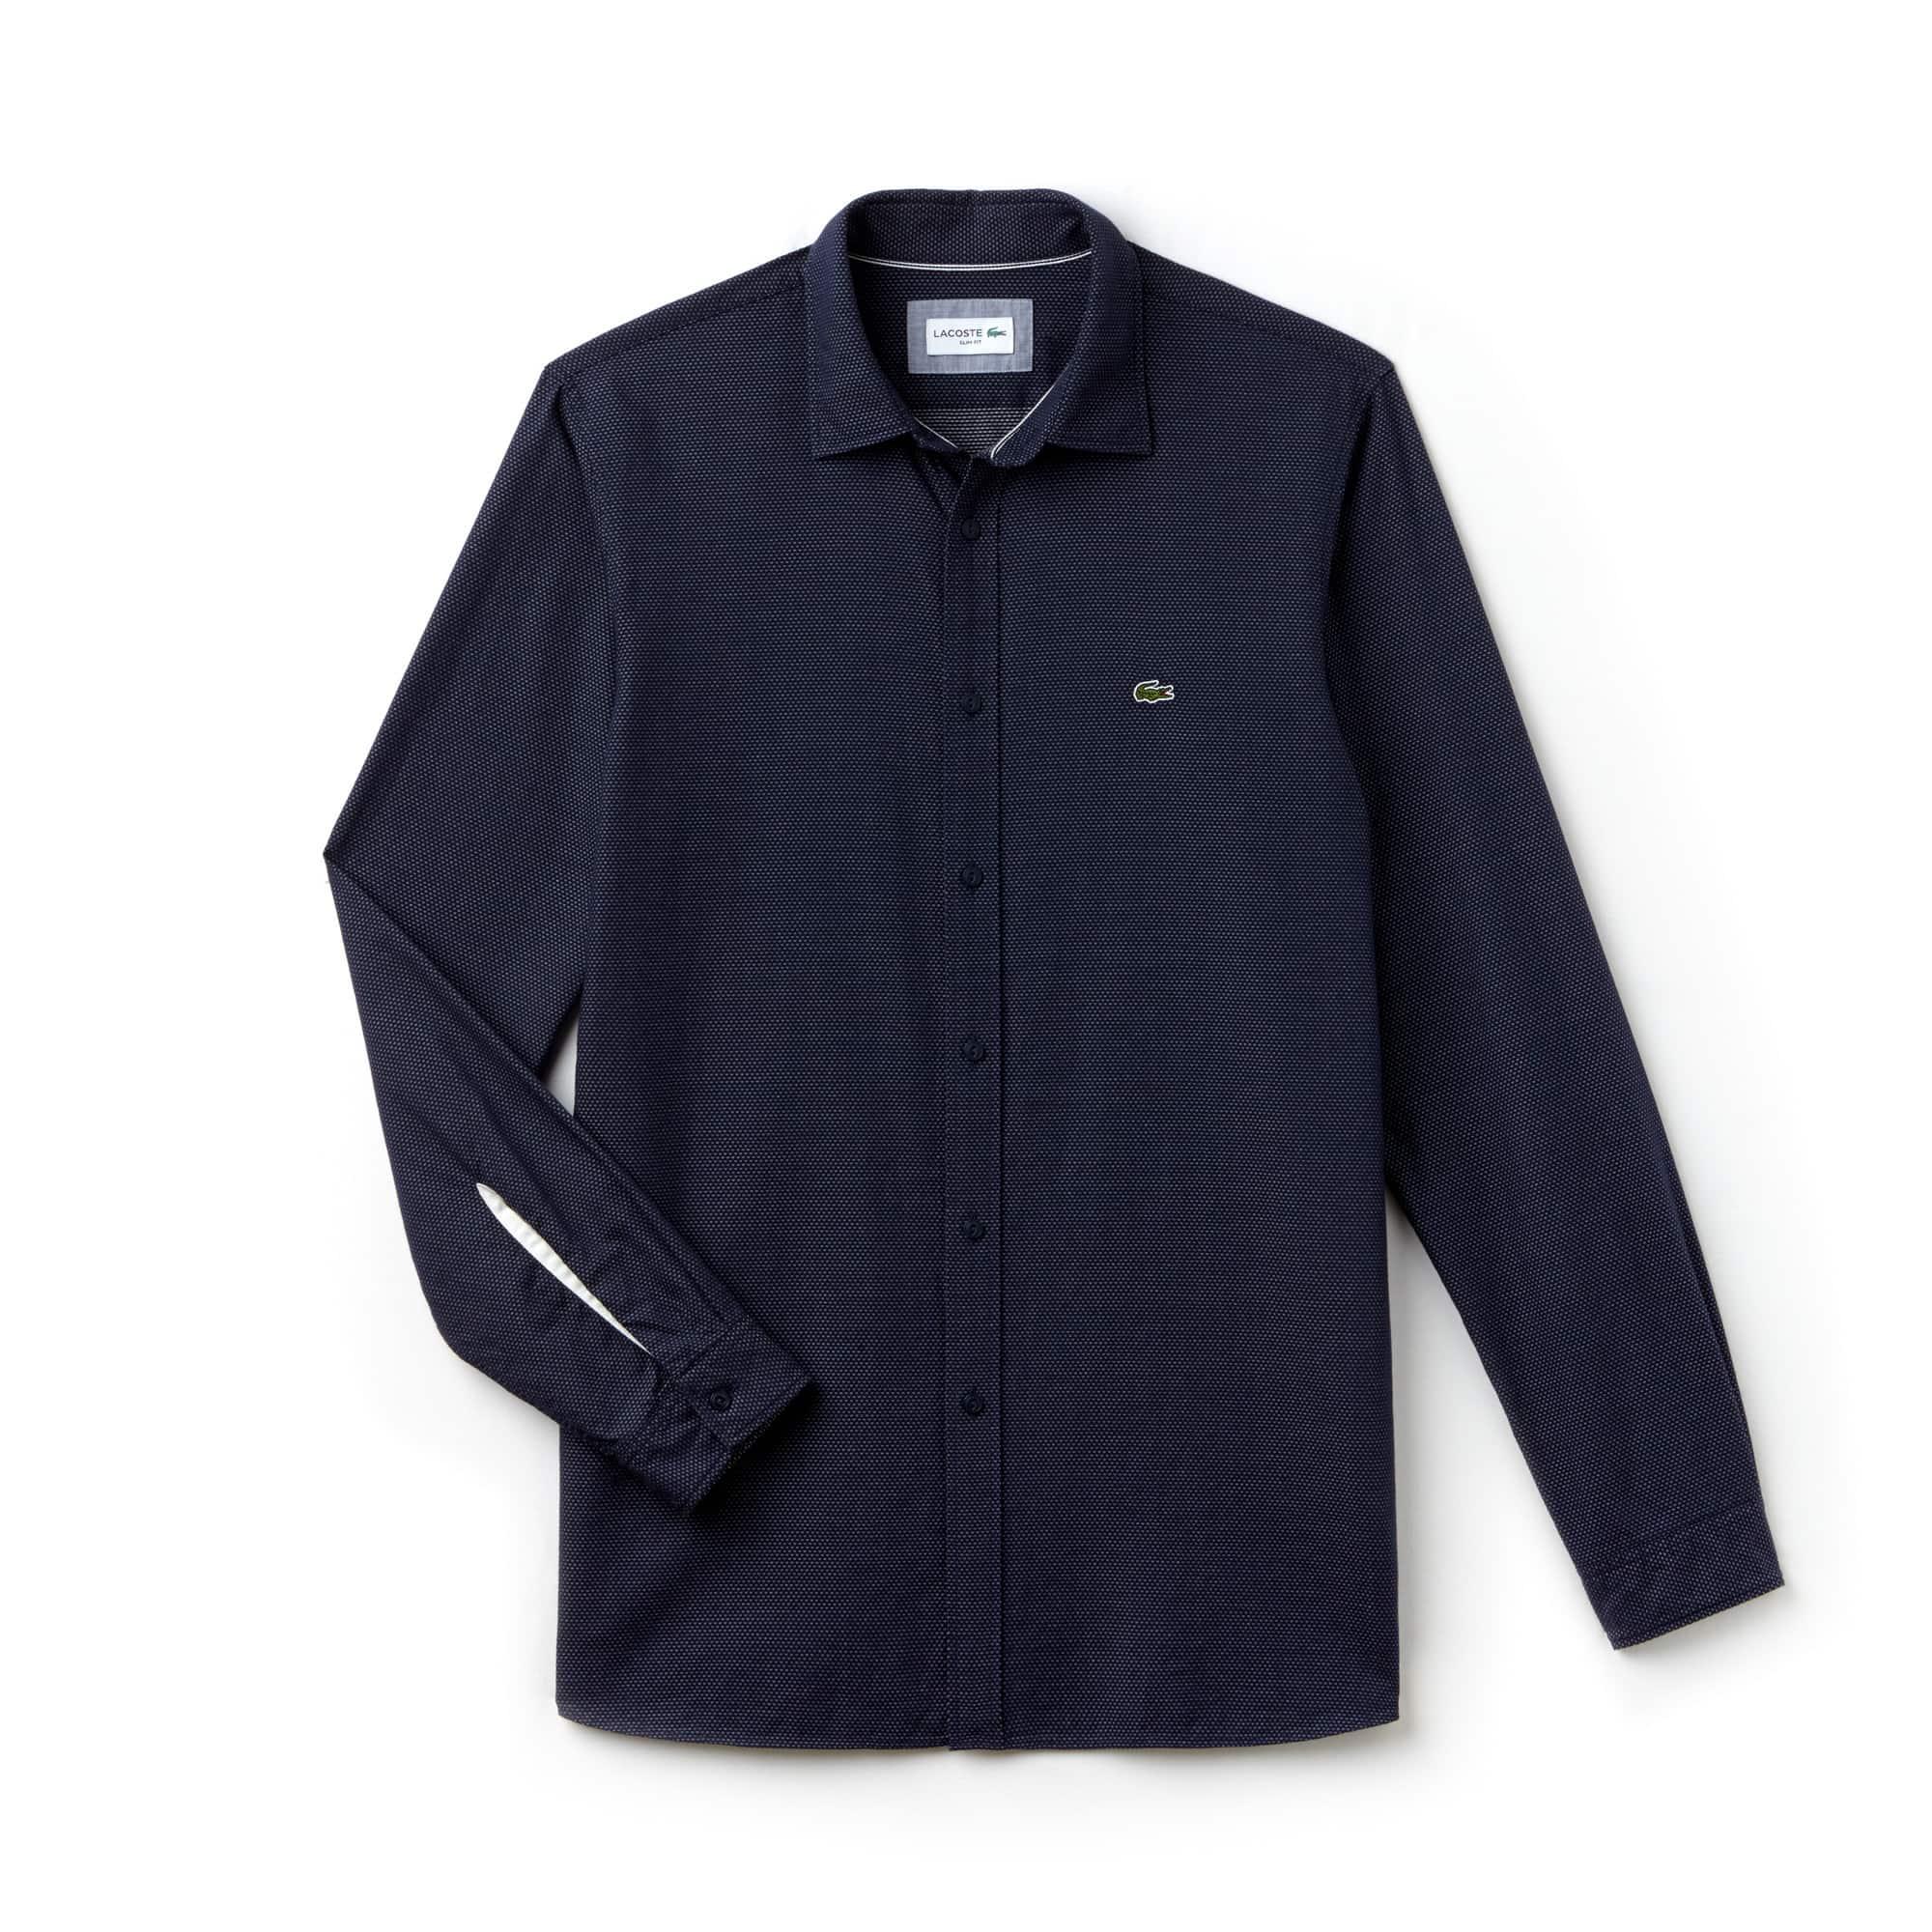 Regular Fit Herren-Hemd aus gepunkteter Jacquard-Popeline